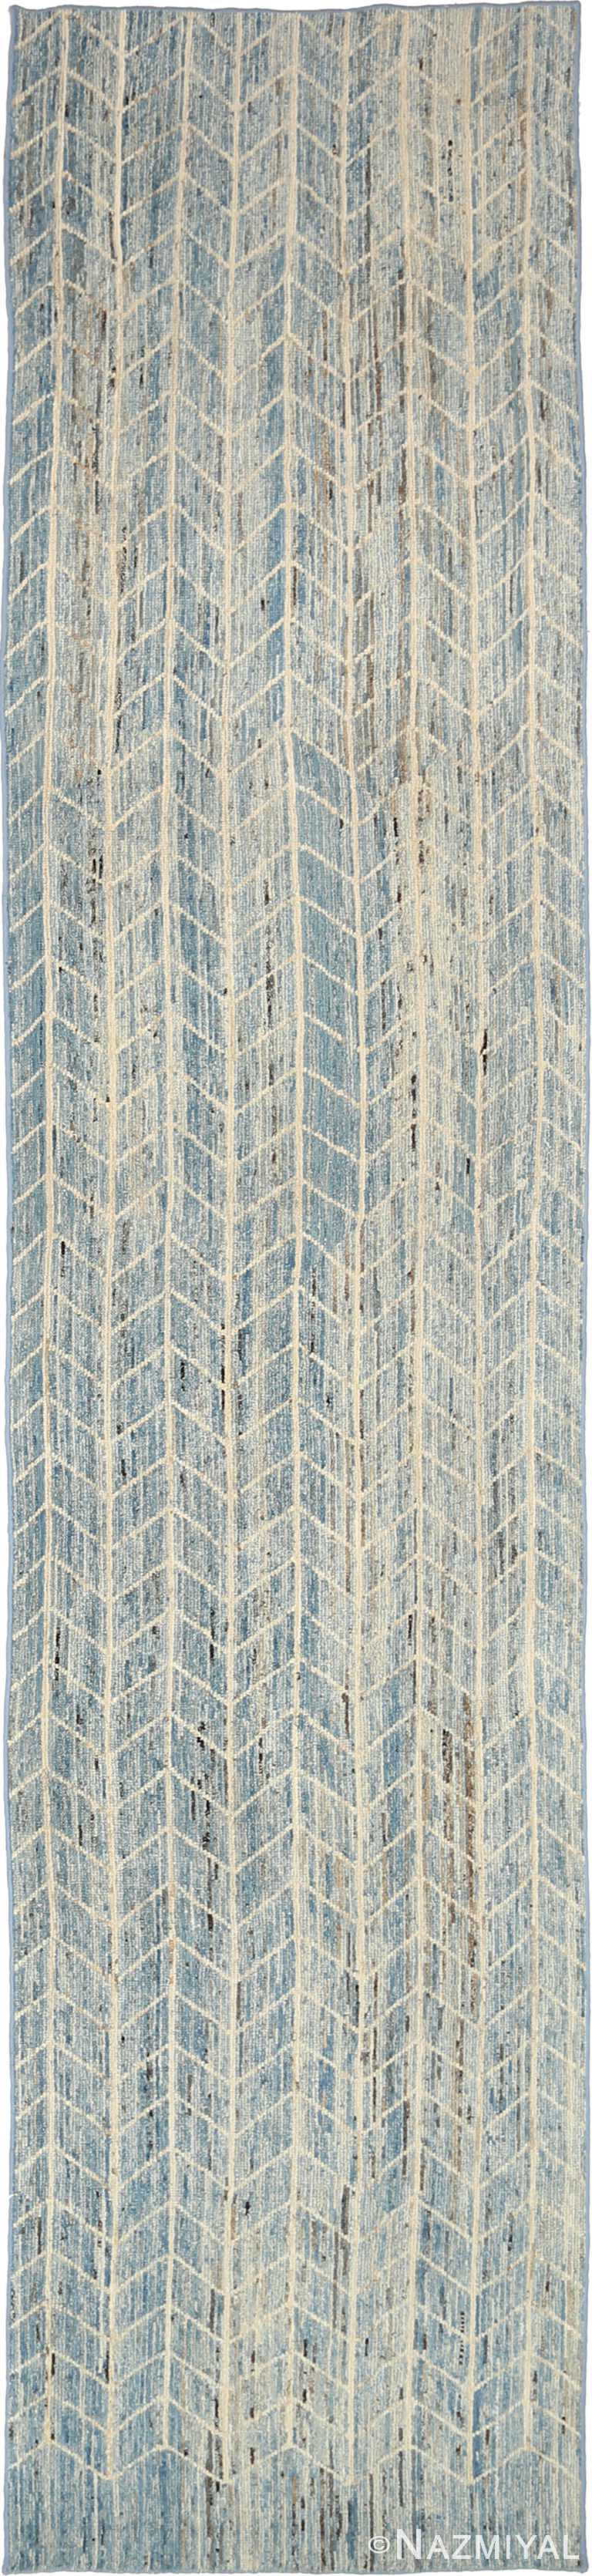 Blue Beige Geometric Modern Distressed Runner Rug 60882 by Nazmiyal Antique Rugs